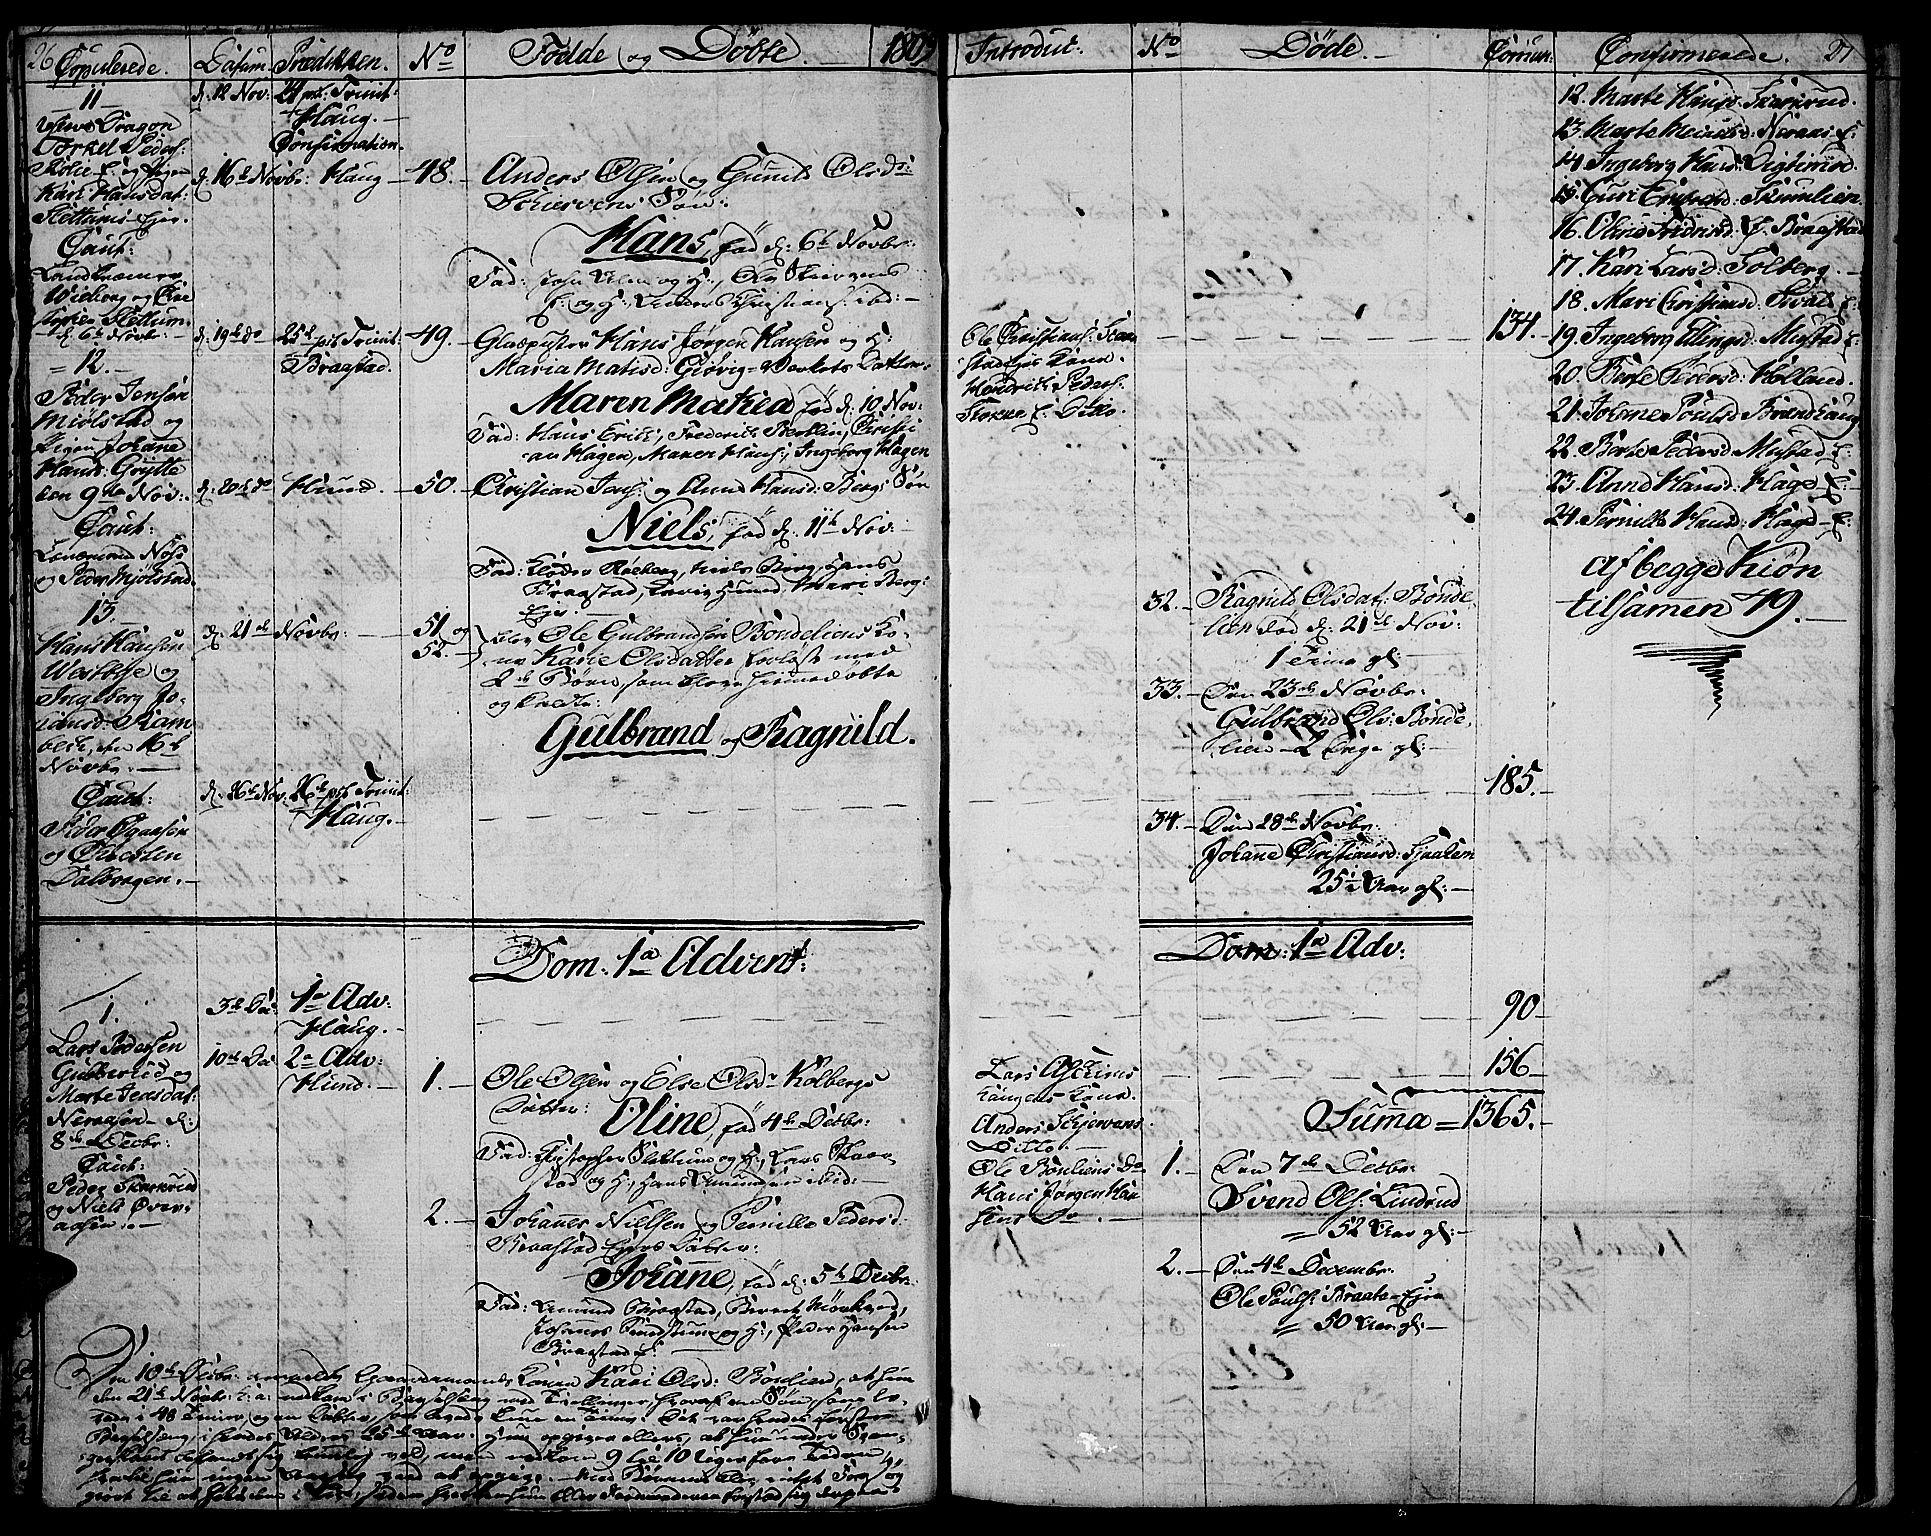 SAH, Vardal prestekontor, H/Ha/Haa/L0003: Ministerialbok nr. 3, 1808-1814, s. 26-27